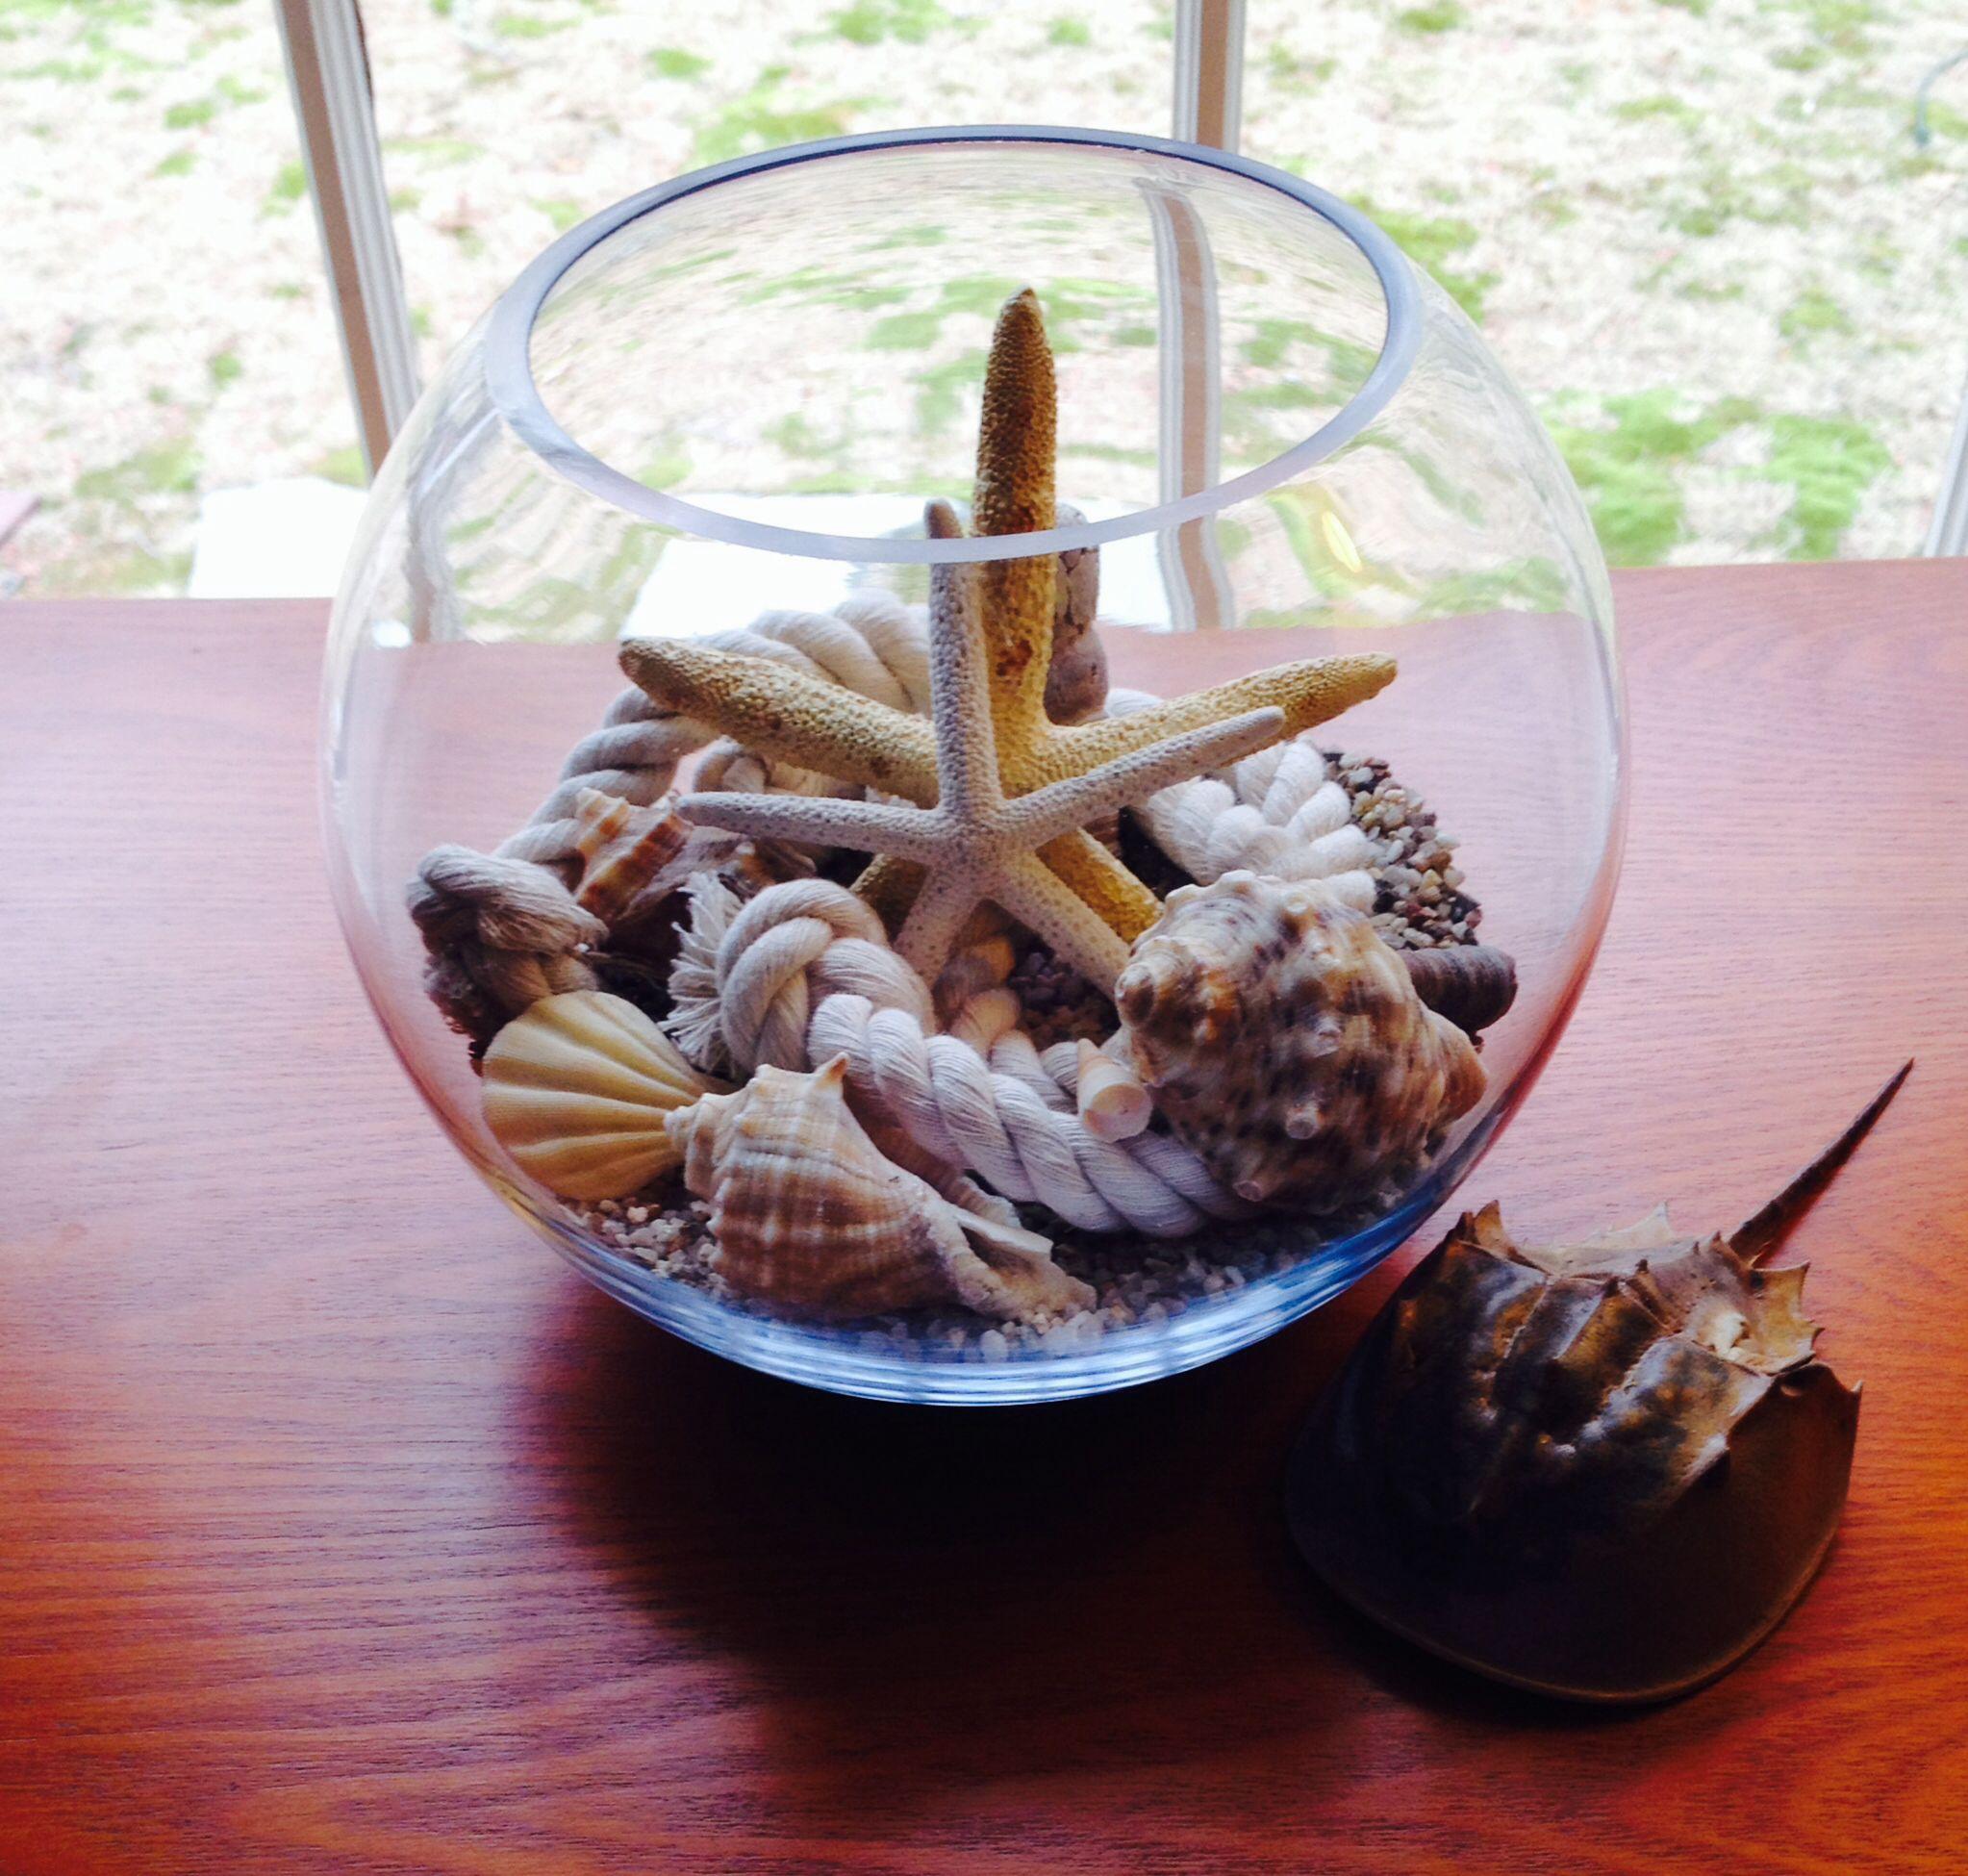 My new fish bowl decor | Belles decor | Pinterest | DIY ideas and Craft